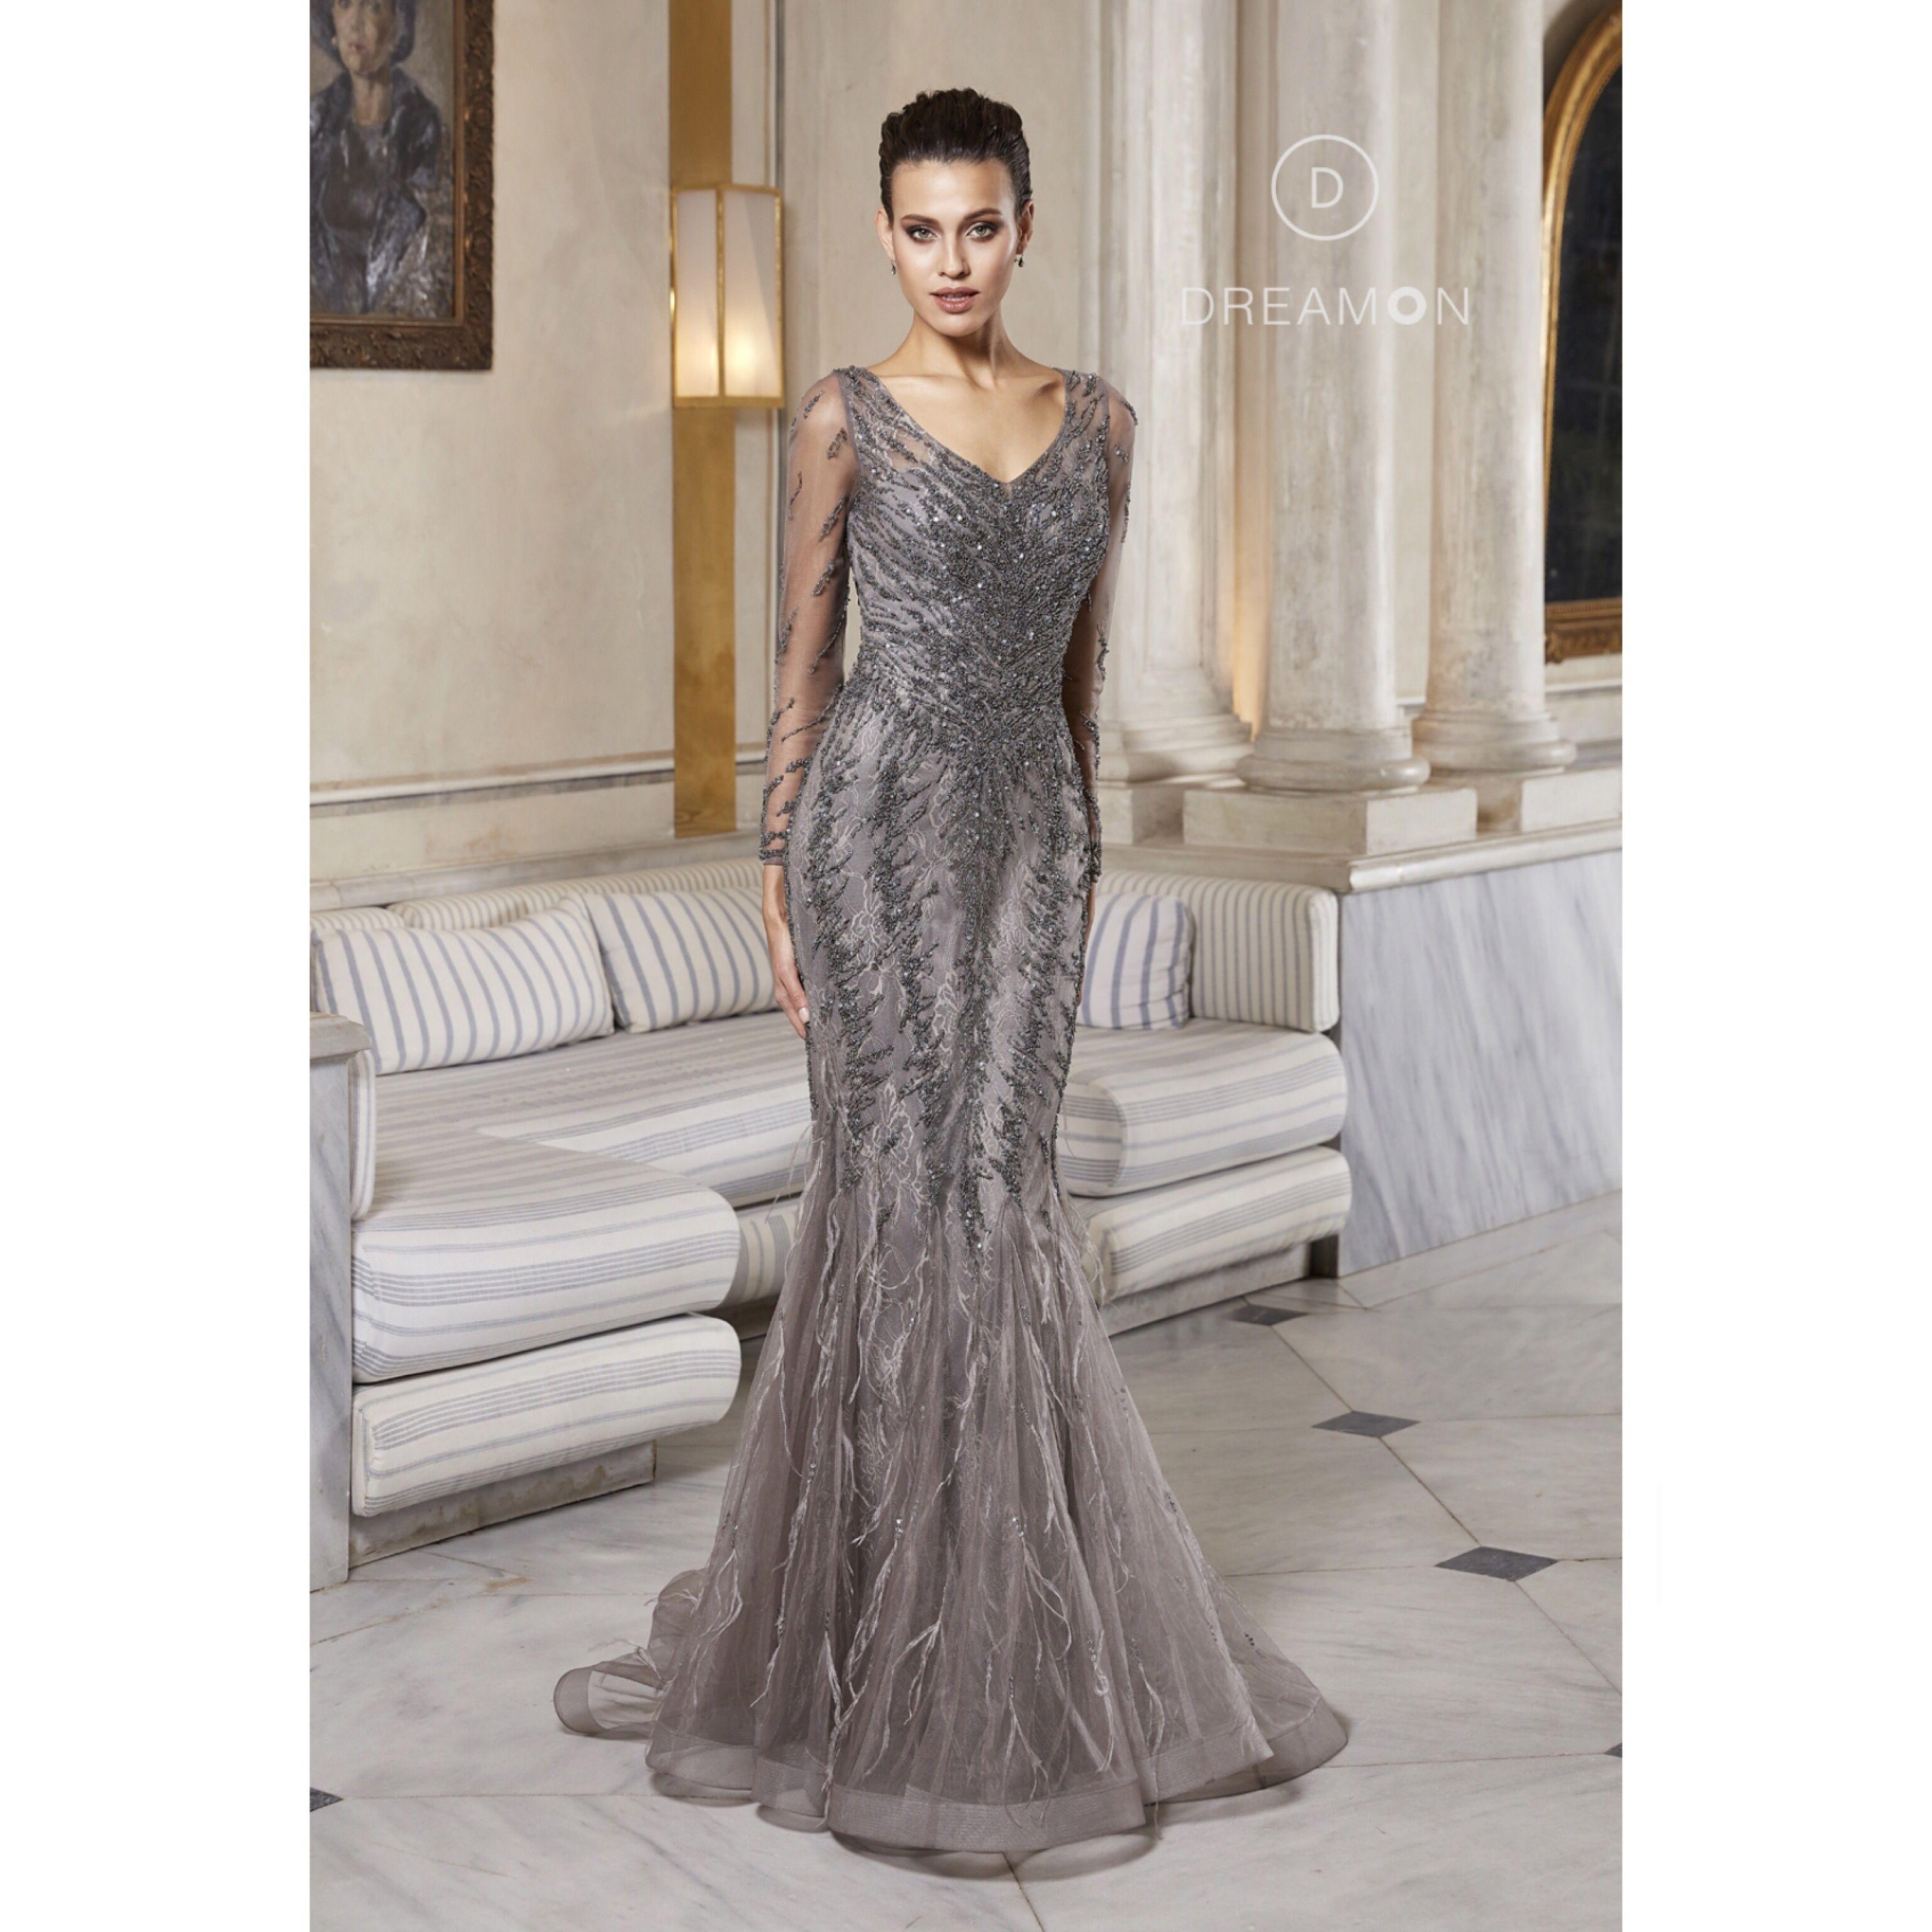 Dreamon Pitane Modeli Amazonlar Uzun Kollu Couture